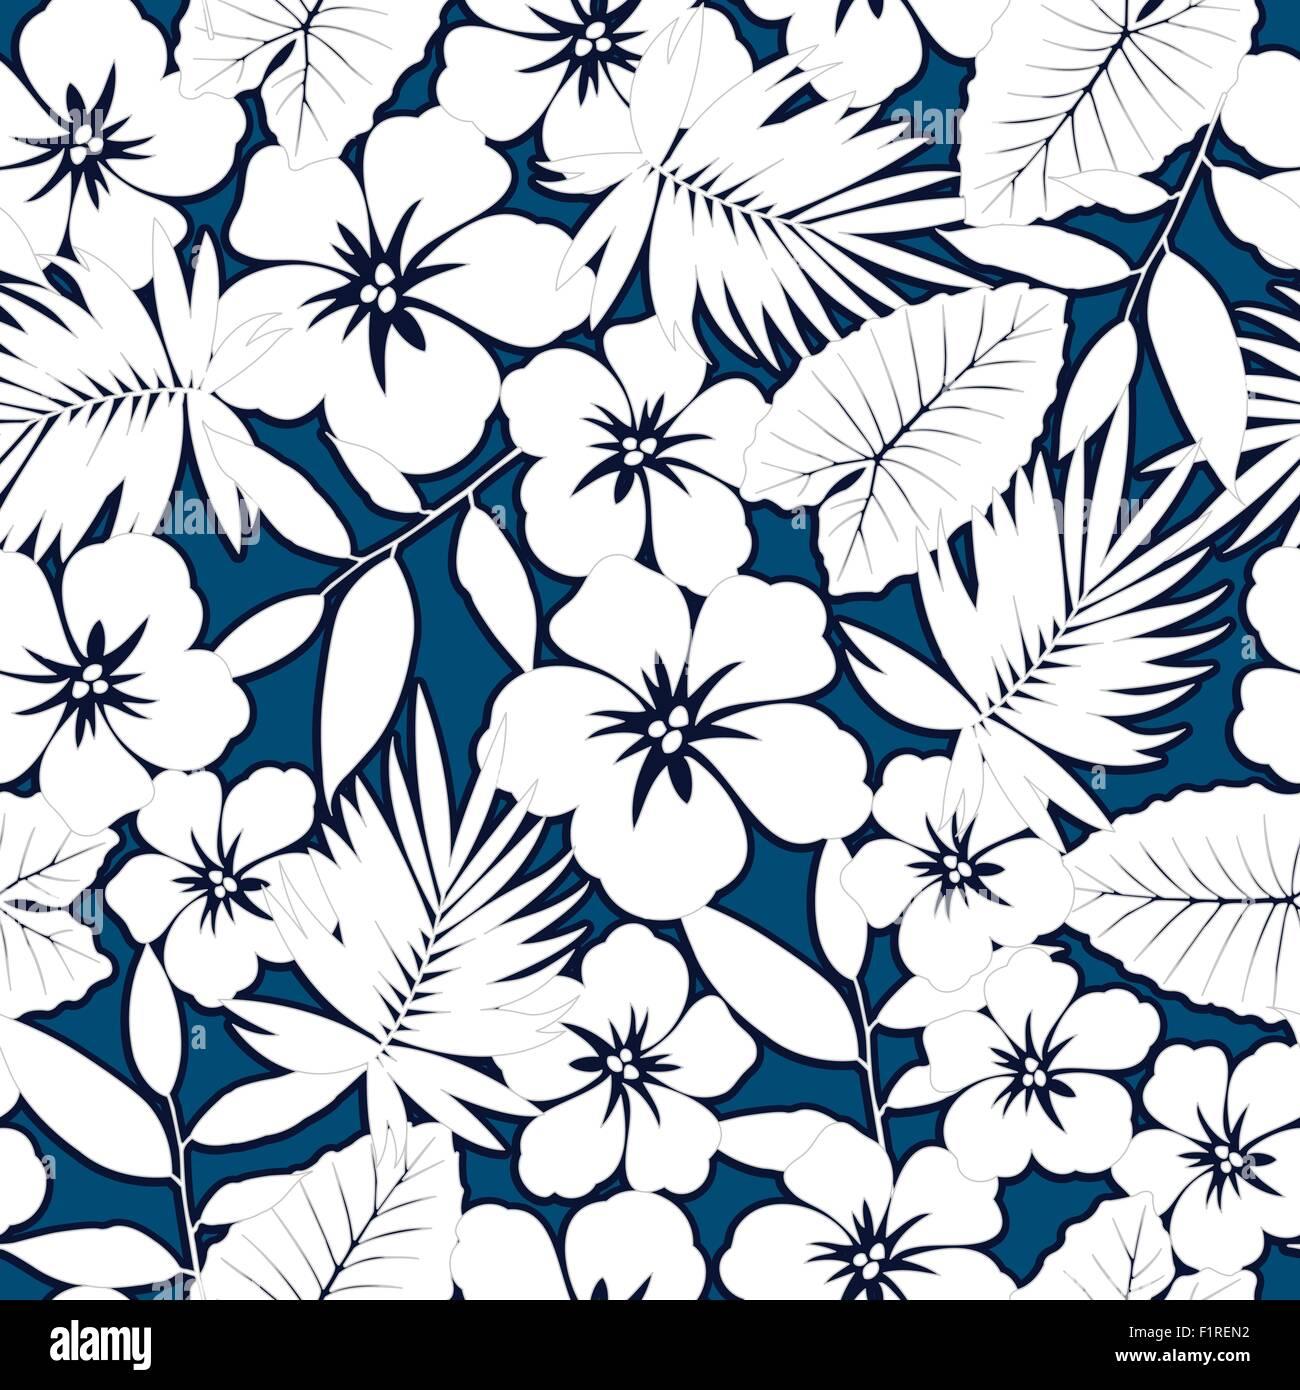 Hawaiian Shirt Pattern High Resolution Stock Photography and ...